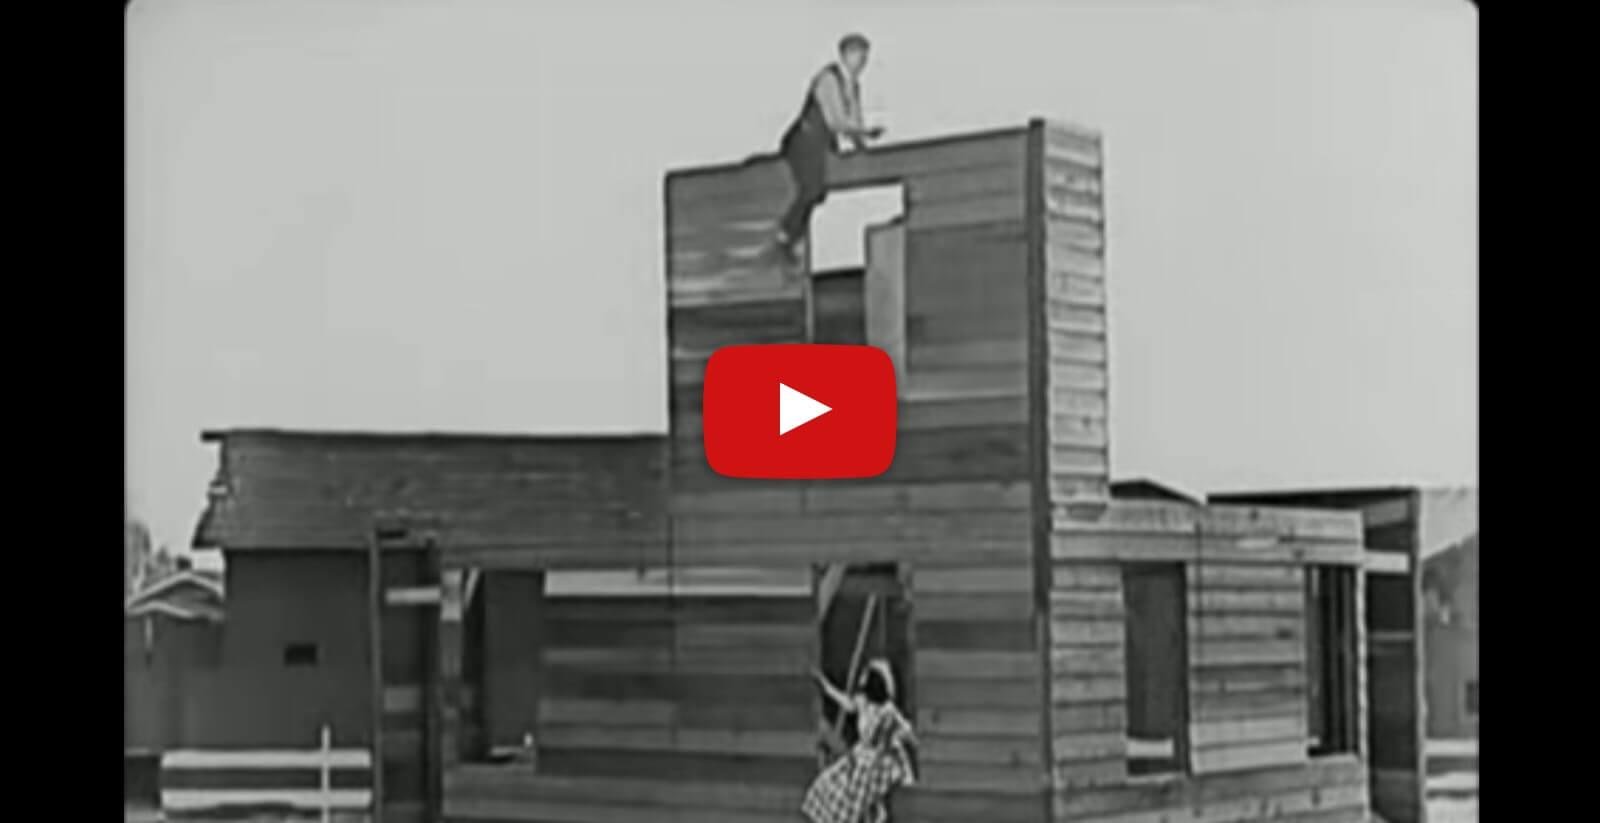 Best of Buster Keaton's stunts